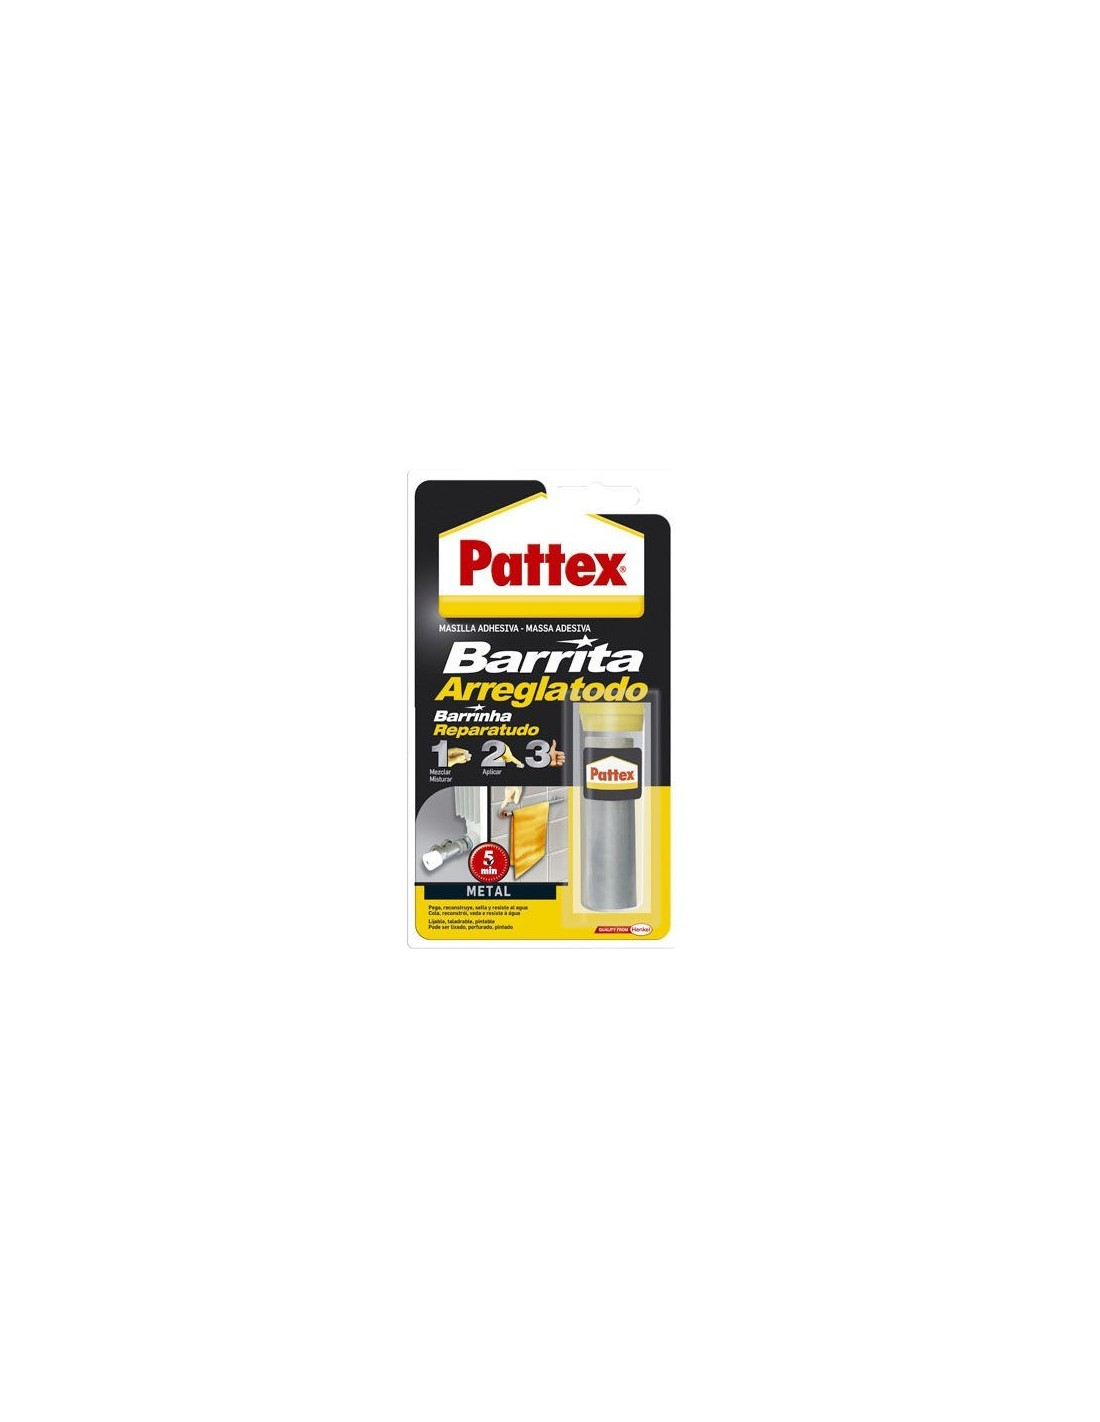 Cortina puerta 90 tiras pvc 90x200cm ferreter a lepanto for Puertas 90 x 210